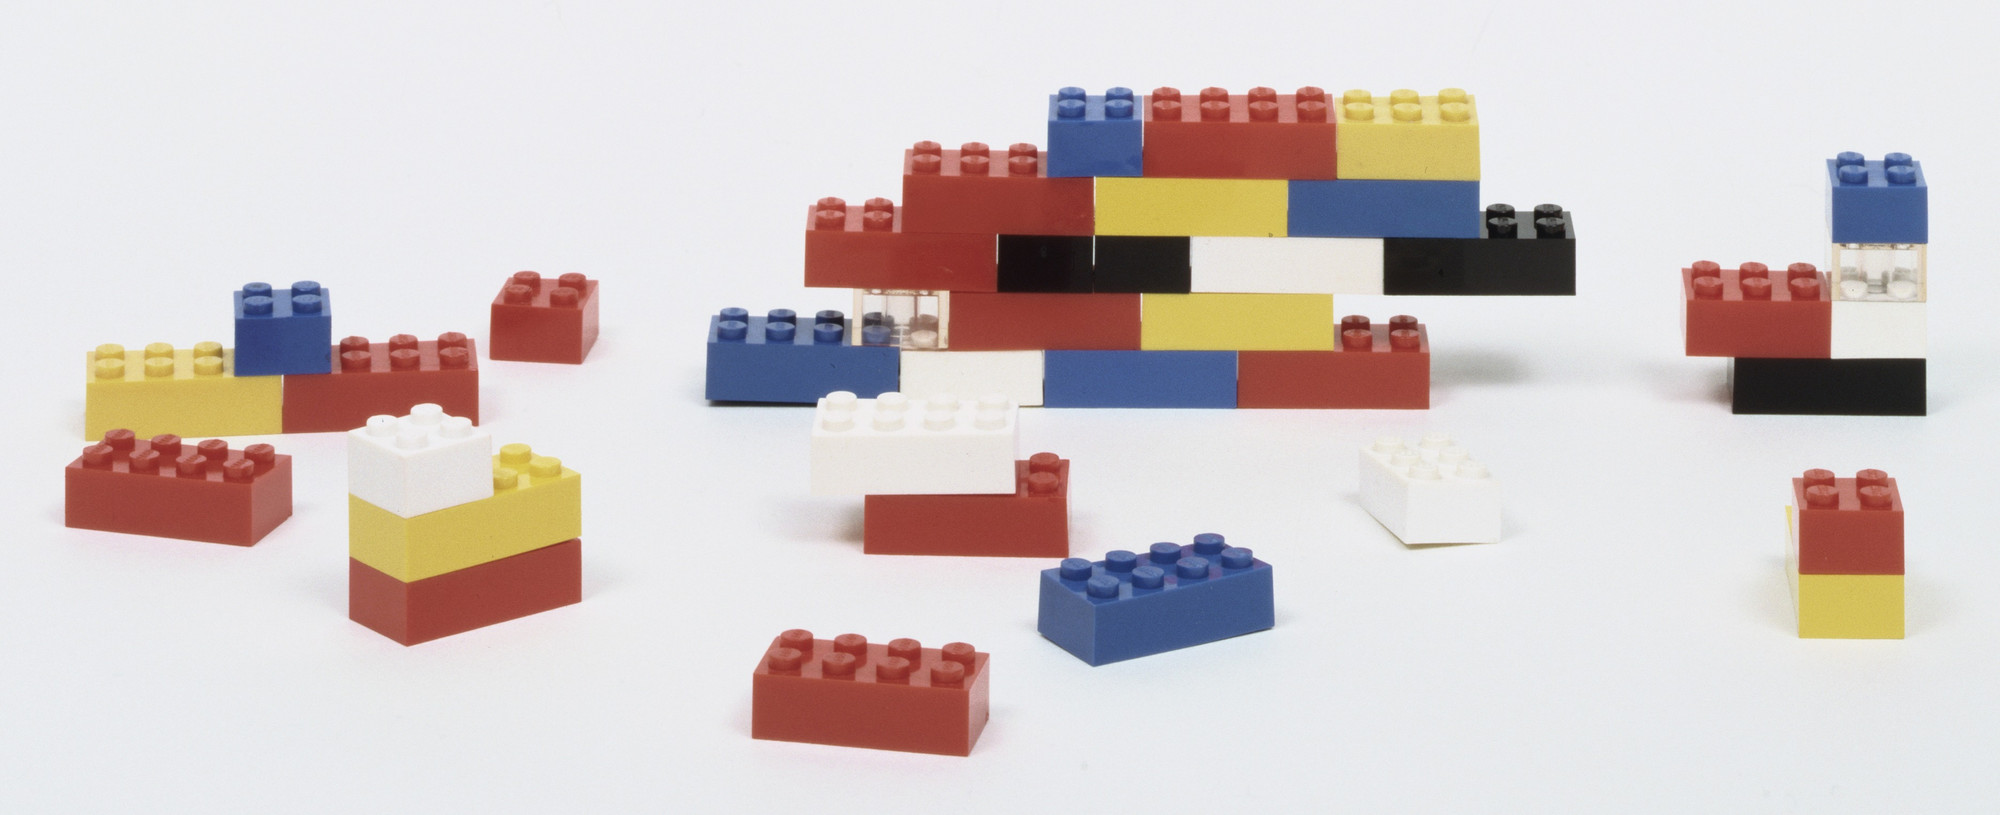 Godtfred Kirk Christiansen Lego Building Bricks 19541958 Moma